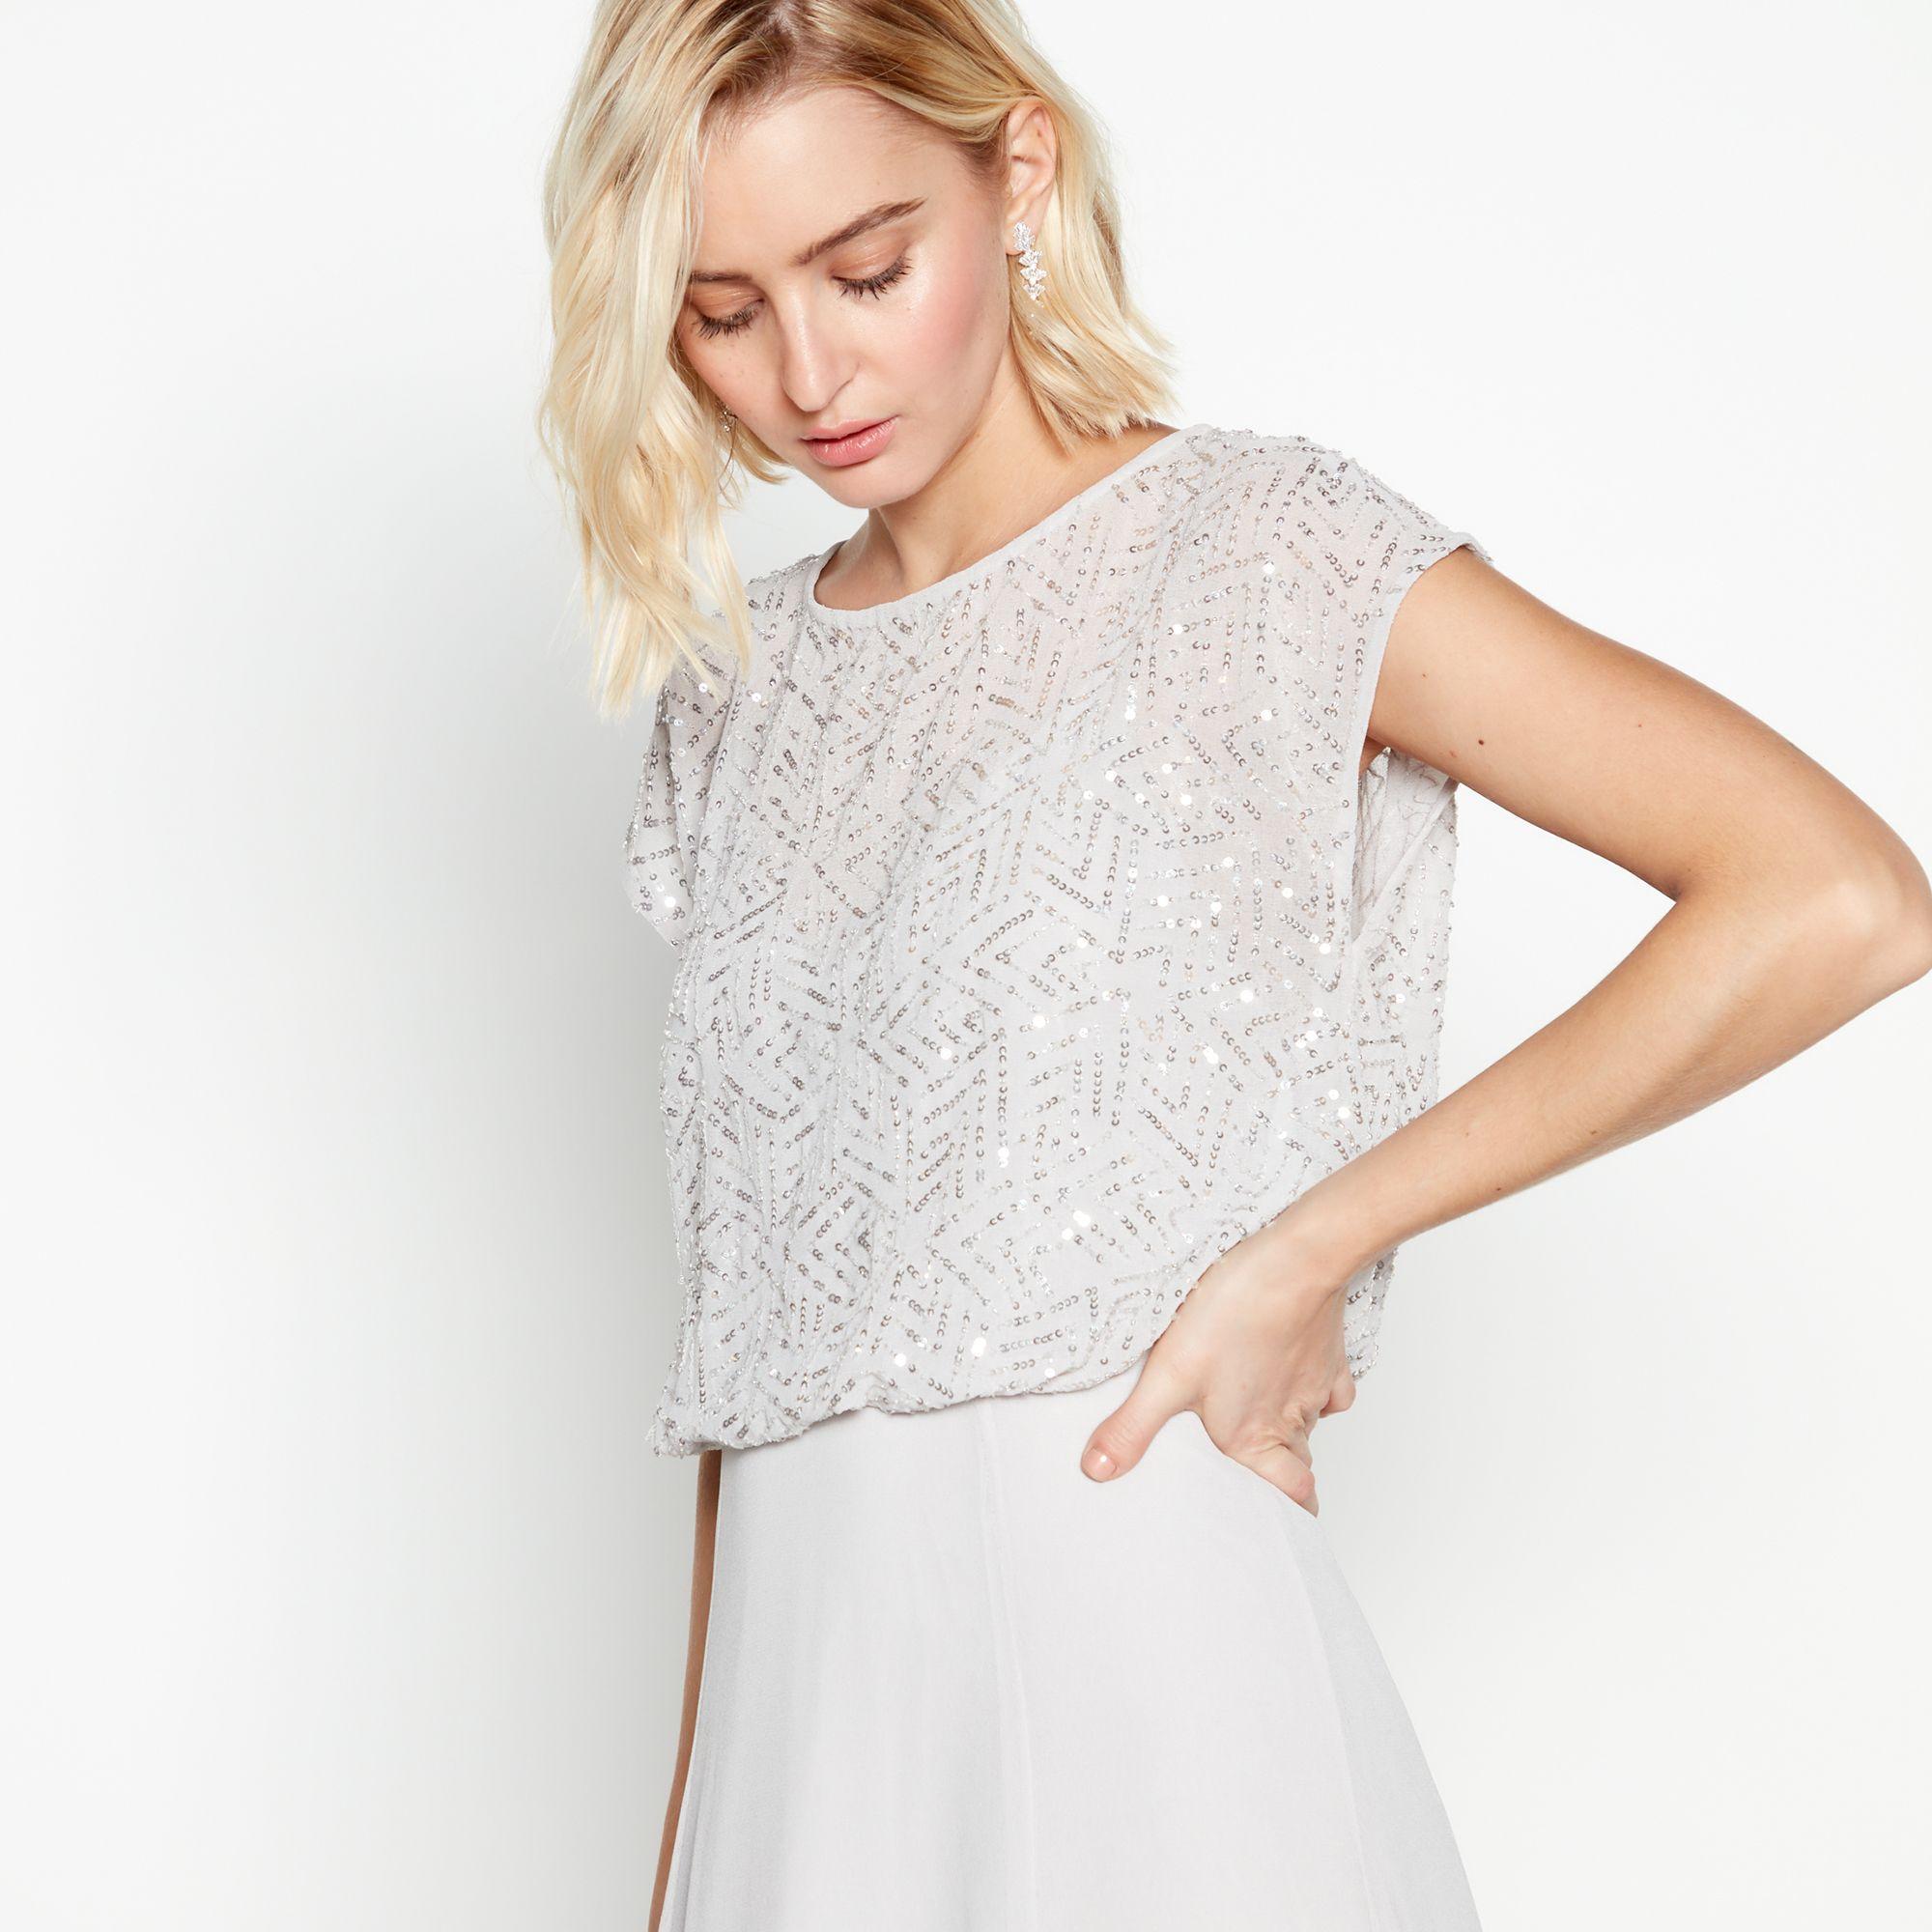 ... Silver Beaded Chiffon Maxi Dress - Lyst. View fullscreen eab0a7418